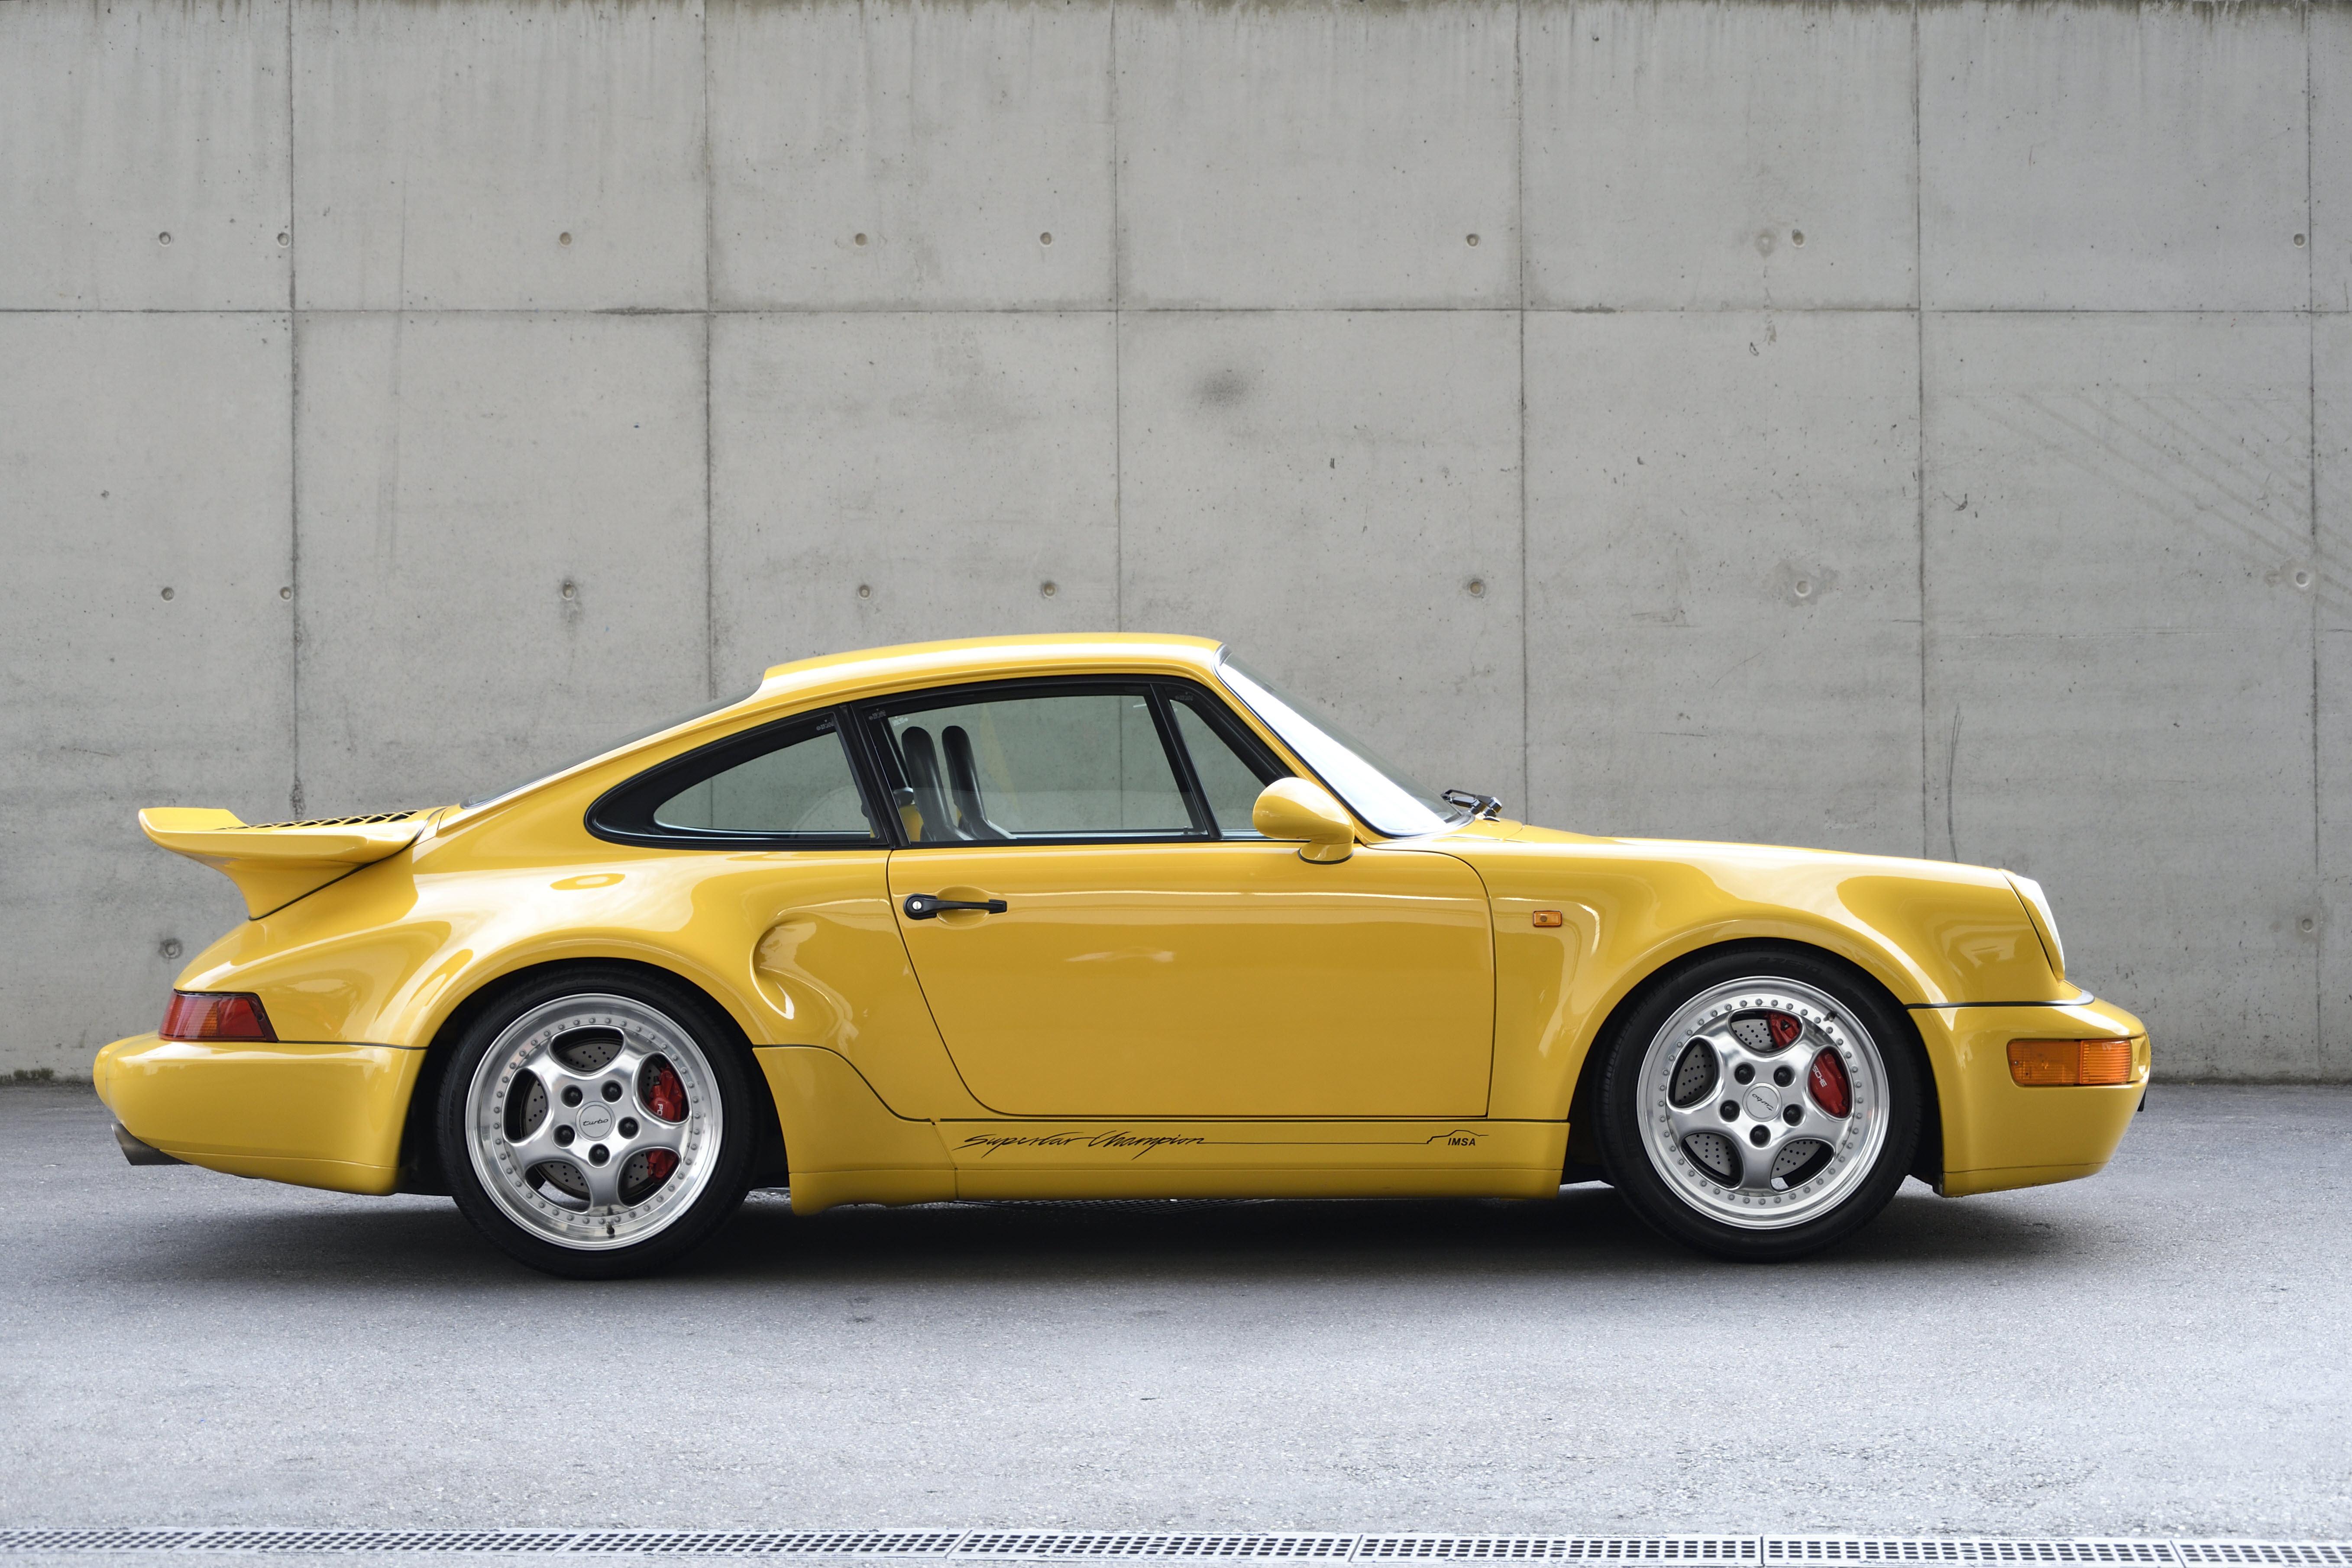 The Porsche 911 Turbo S Leichtbau